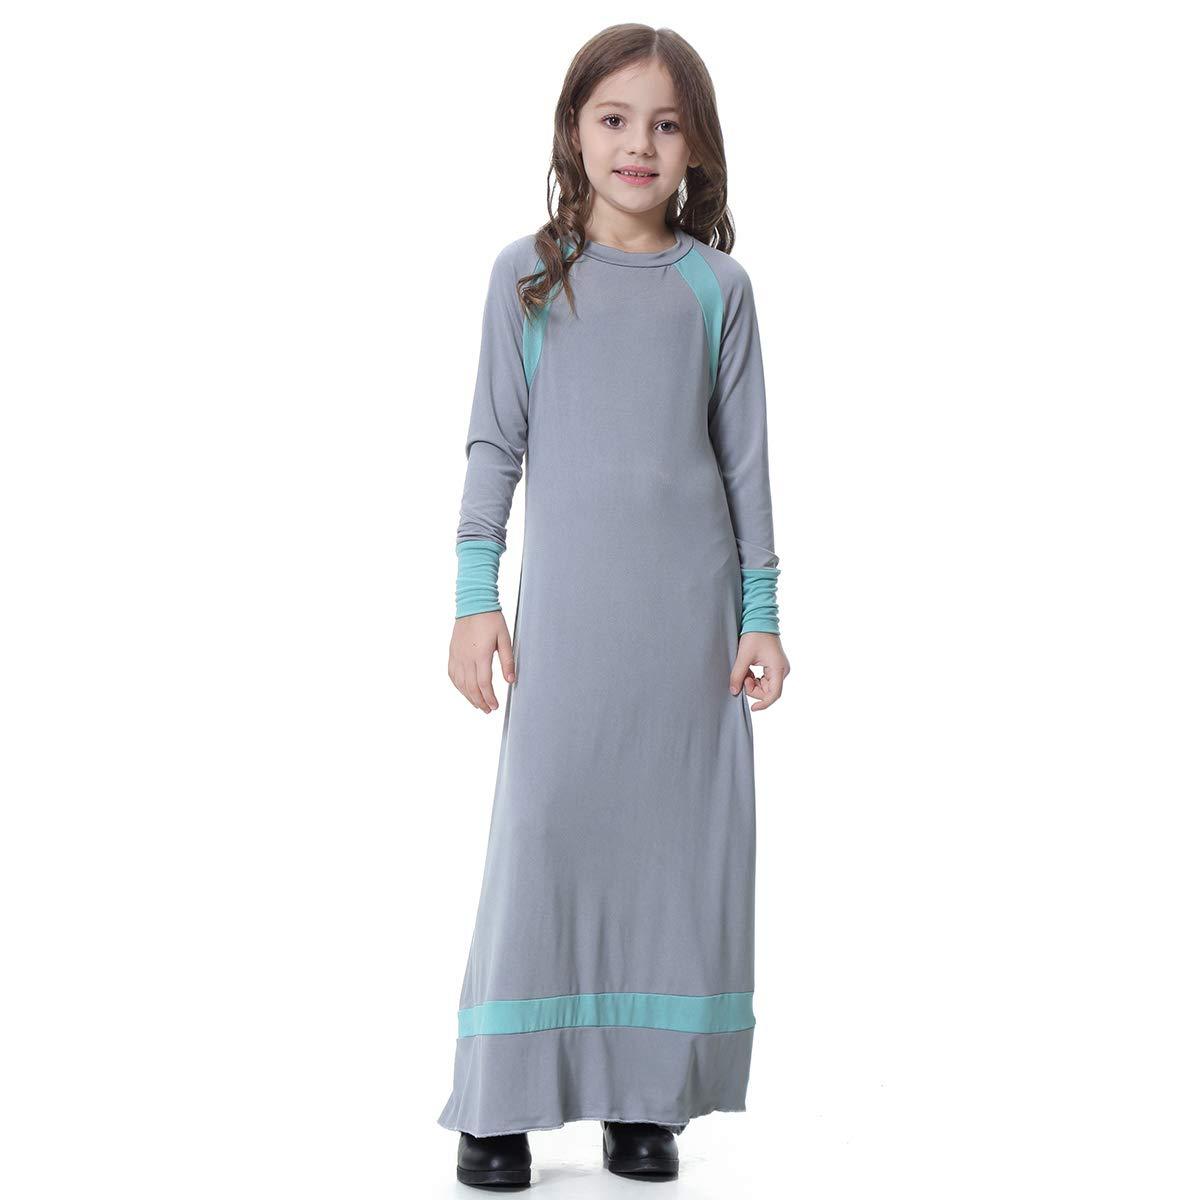 BMSGM Medio Oriente Arabia Saudita Lslamic Étnico Chica Algodón ...